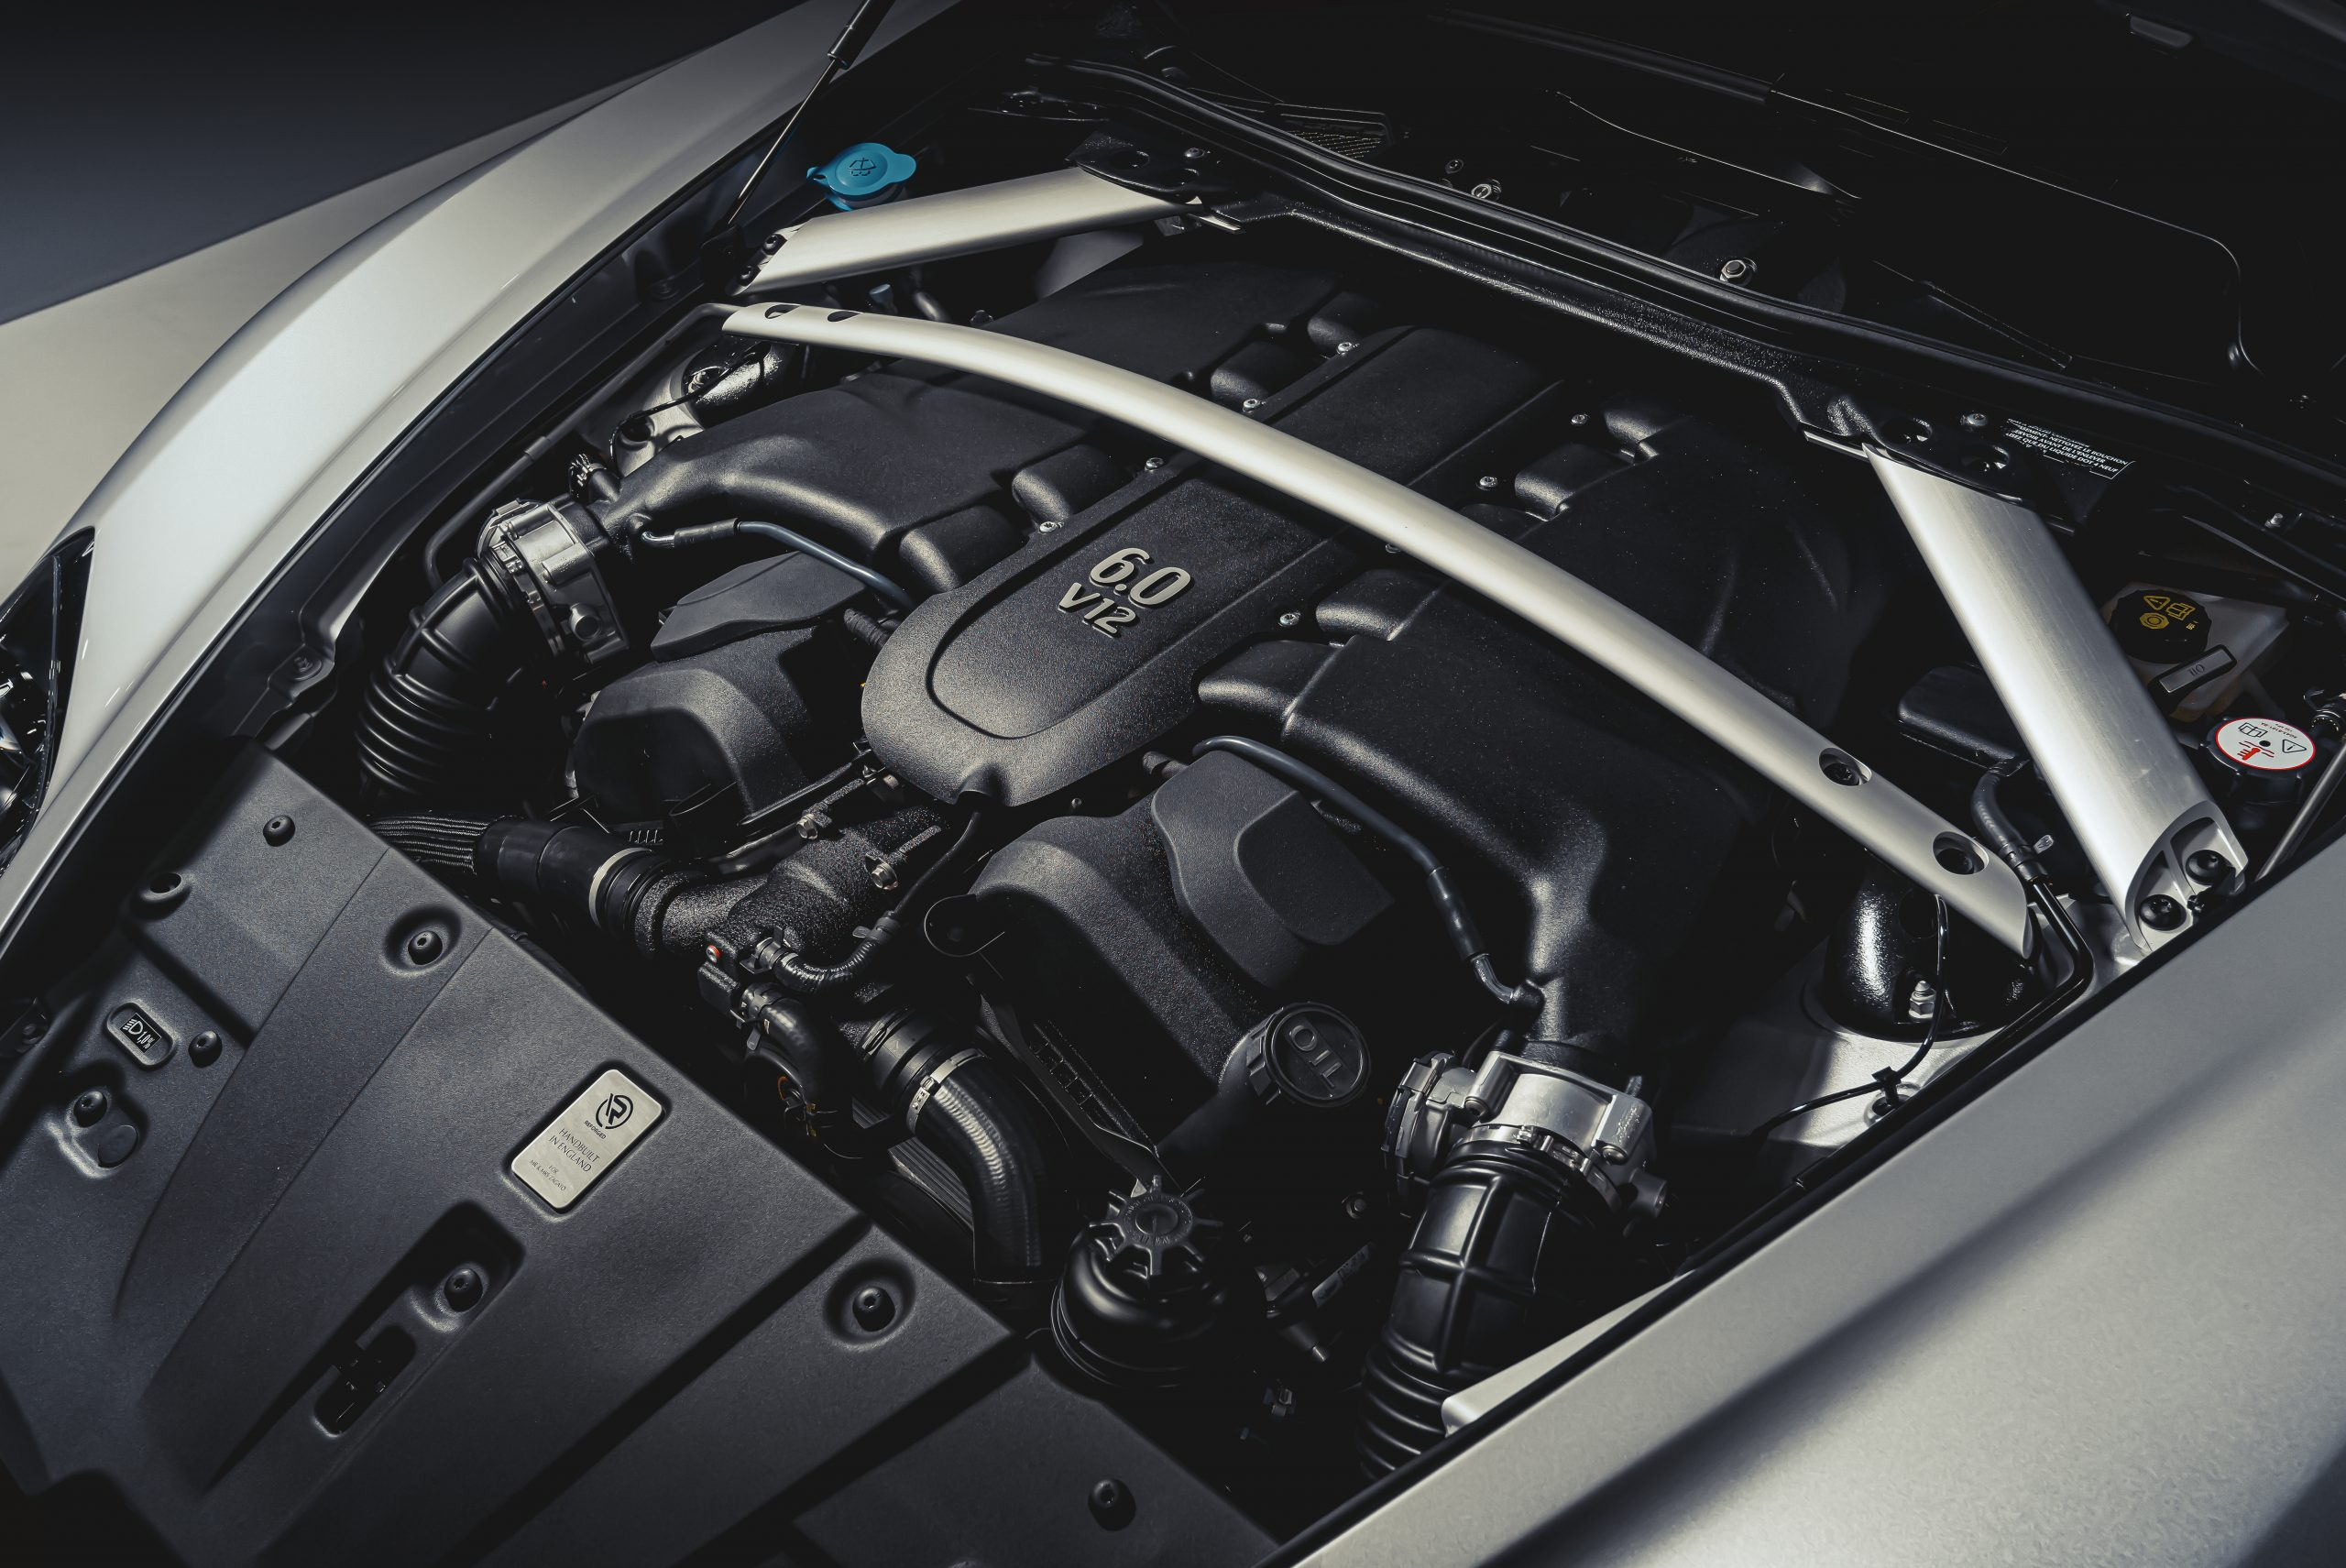 Aston Martin Vantage V12 Zagato Heritage TWINS by R-Reforged underbonnet